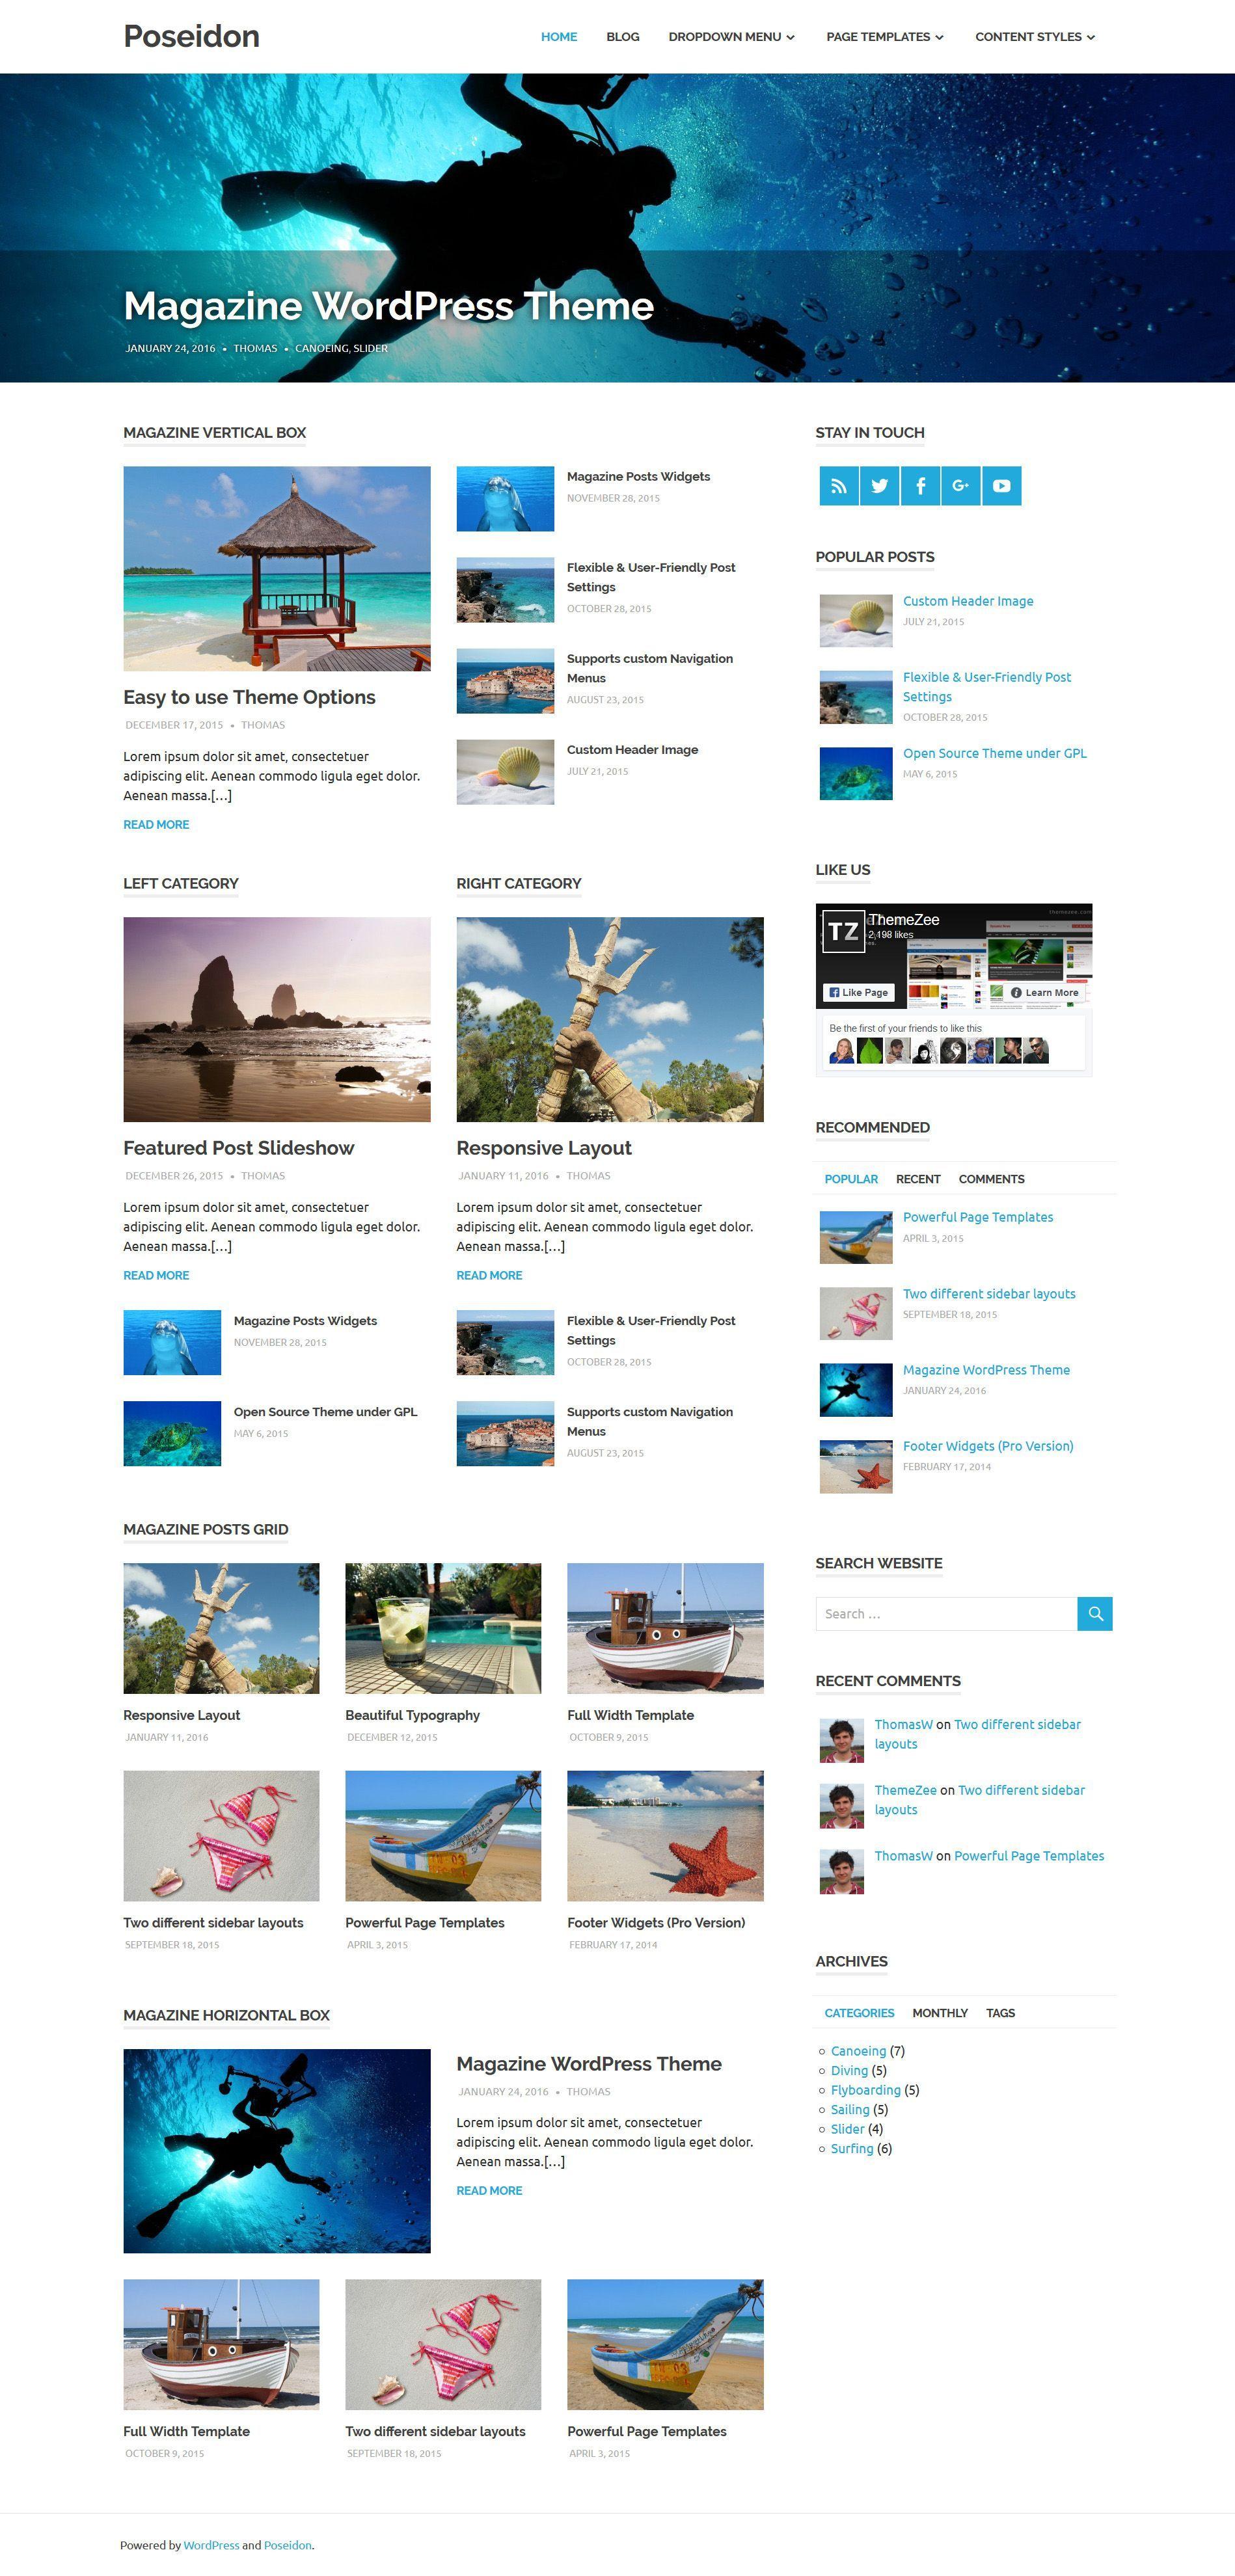 Free Download View Demo Get Hosting Poseidon Is An Elegant Designed